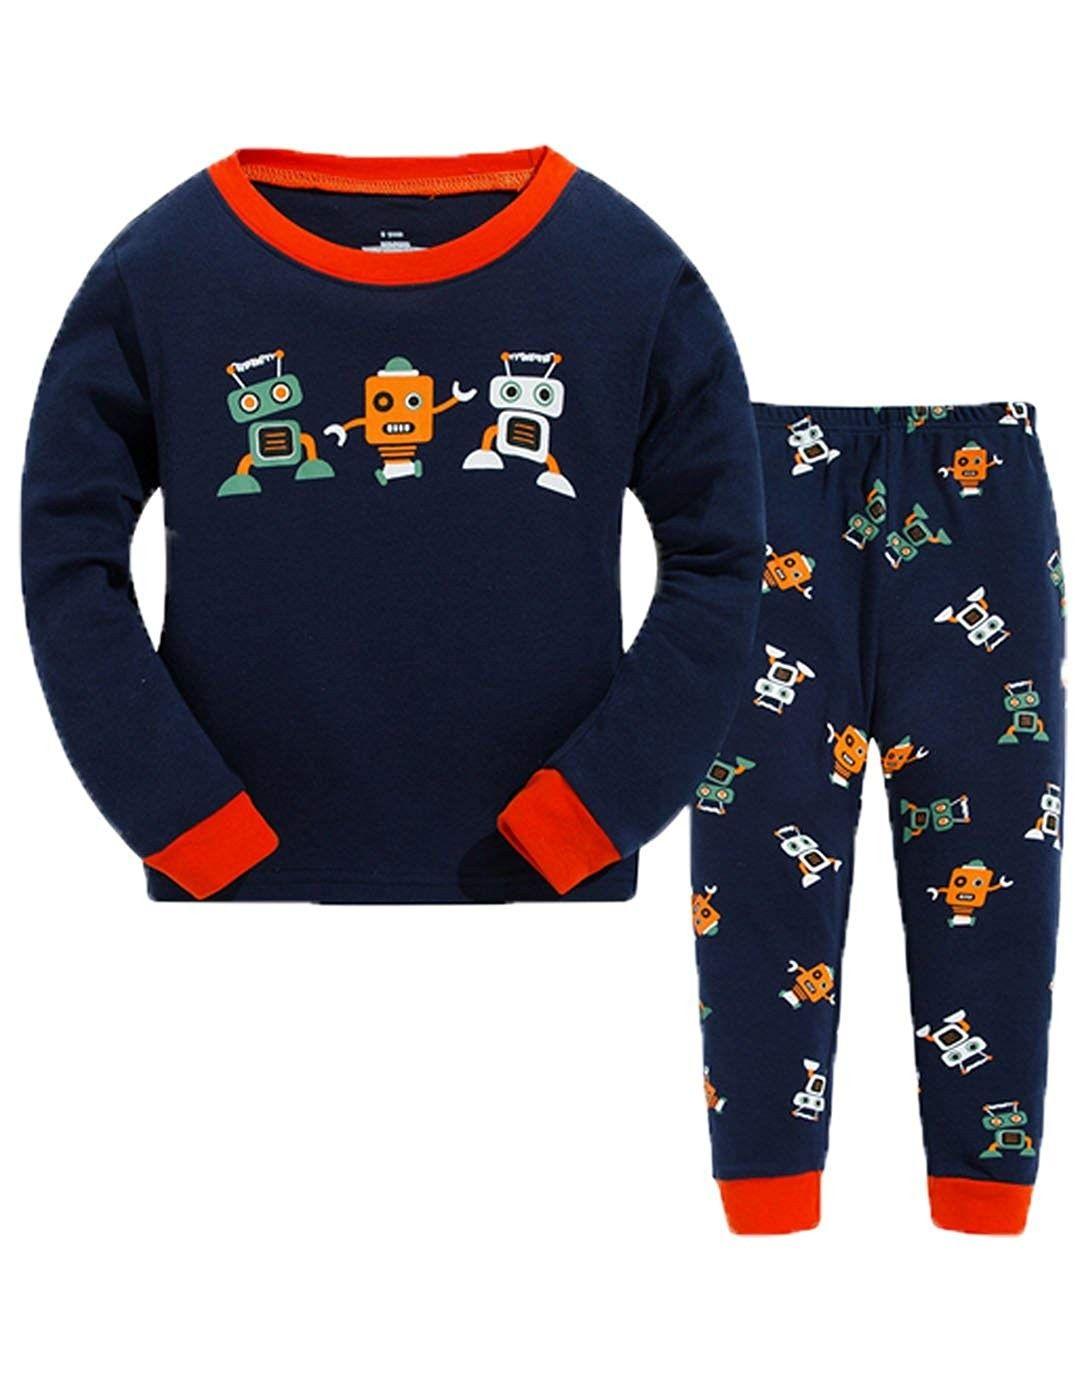 Robot Little Boy Pajamas Sets Boys Sleepwear Children Clothing - Blue -  C9185Z58AG0 | Boys sleepwear, Kids sleepwear, Boys nightwear